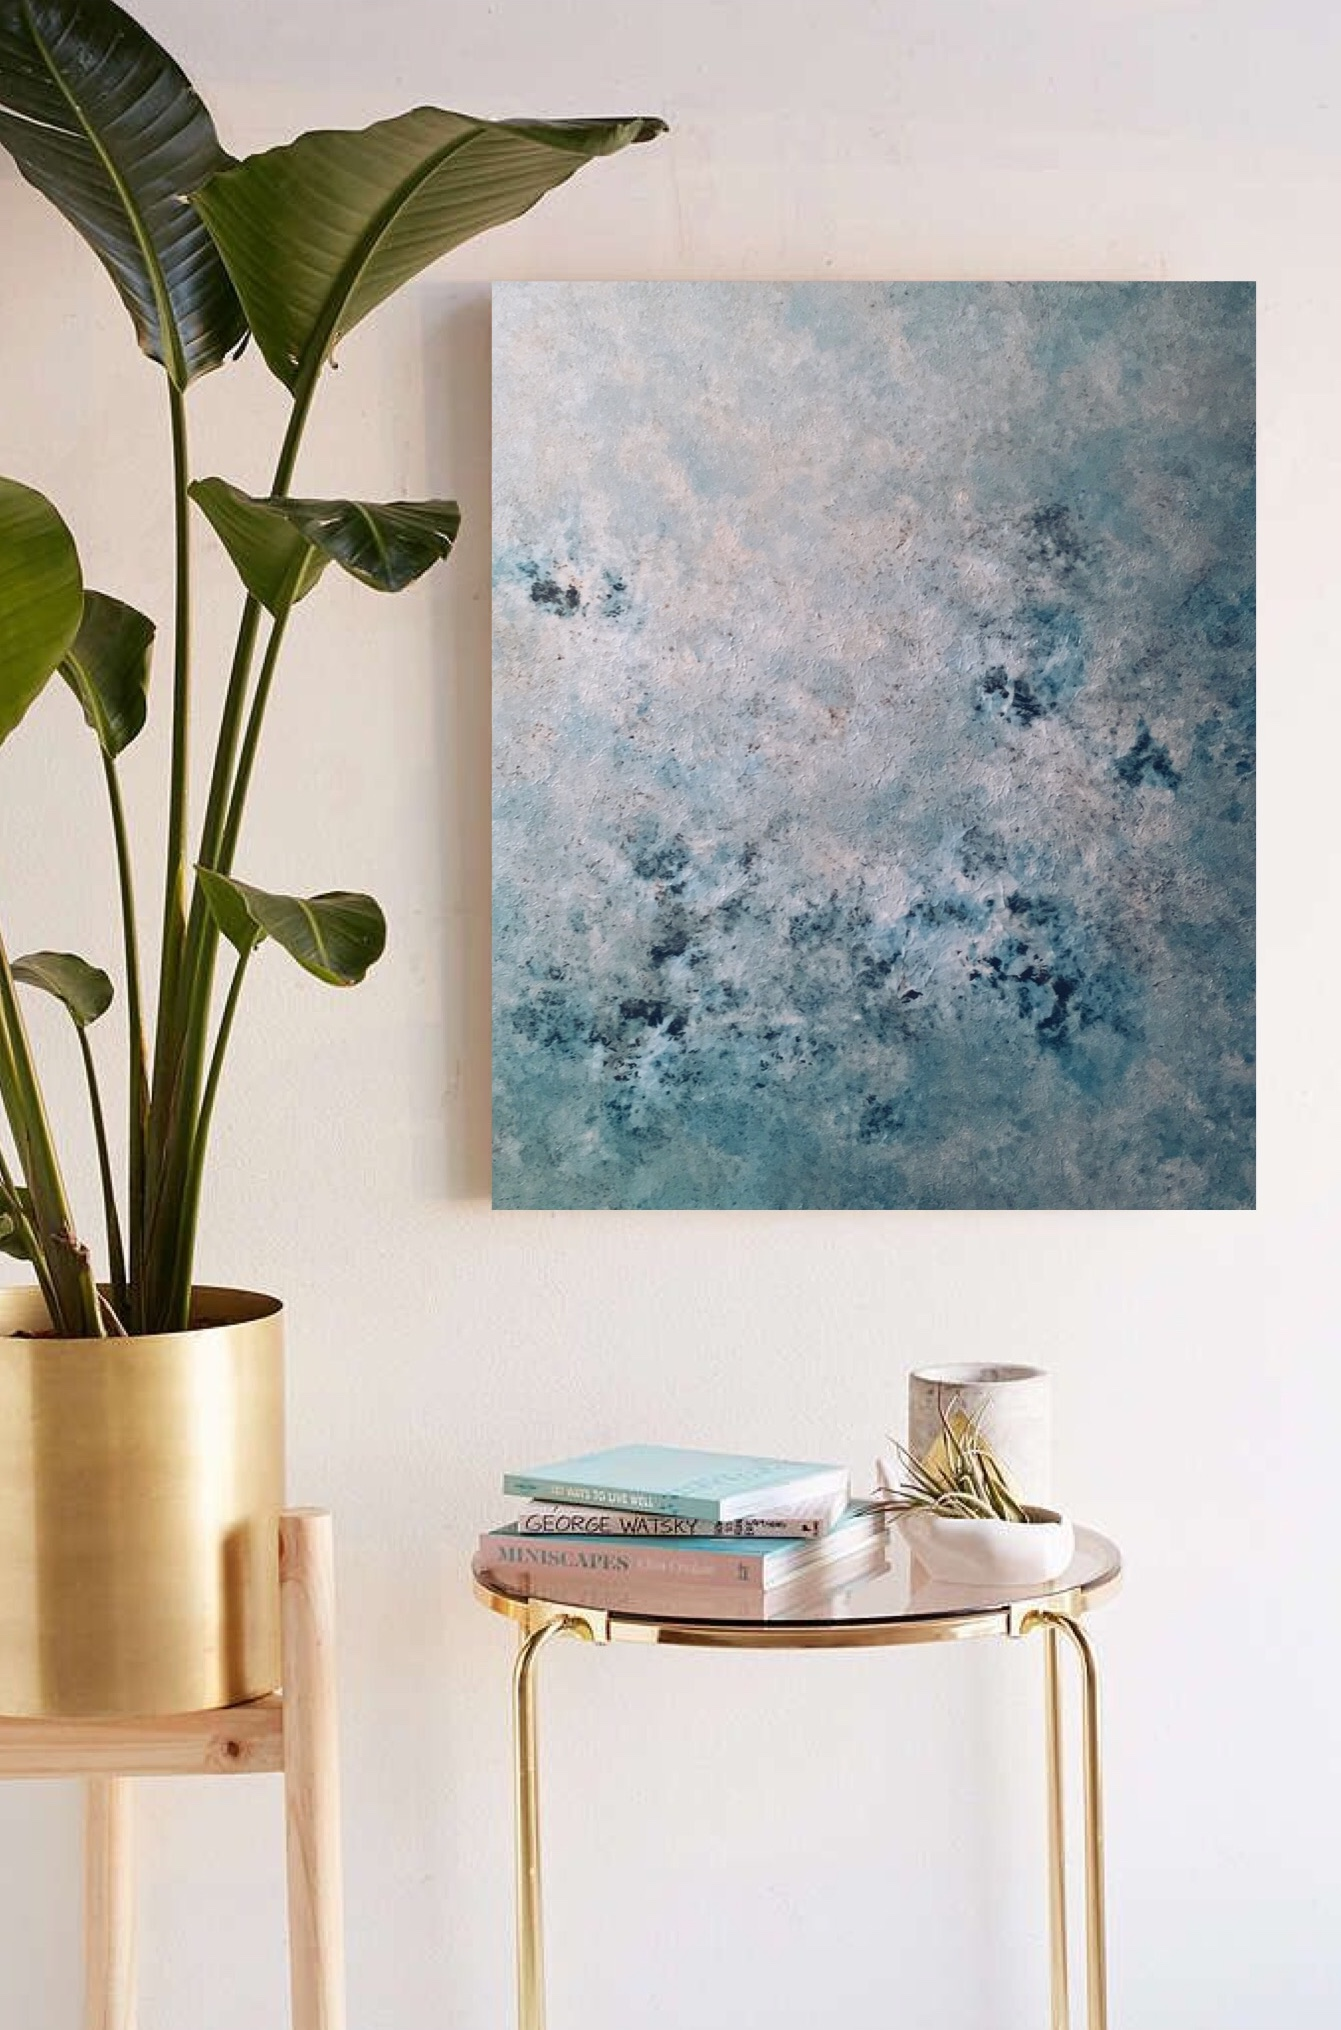 Marine Bonzom - Artiste Peintre Biarritz - Home - Rodéo